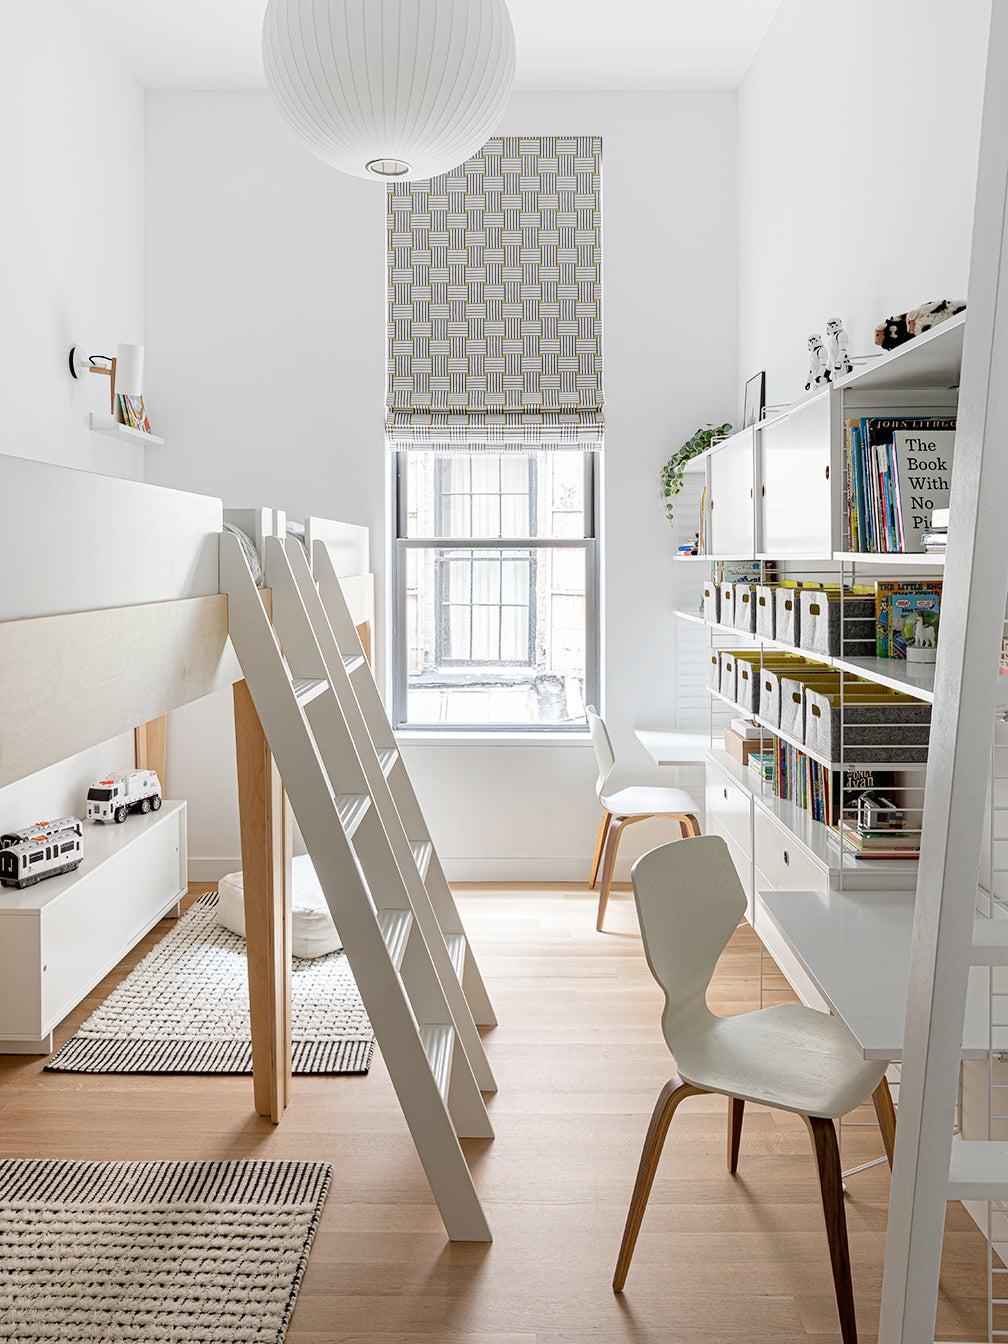 00-FEATURE-Family-Friendly-Loft-Renovation-domino-3×4